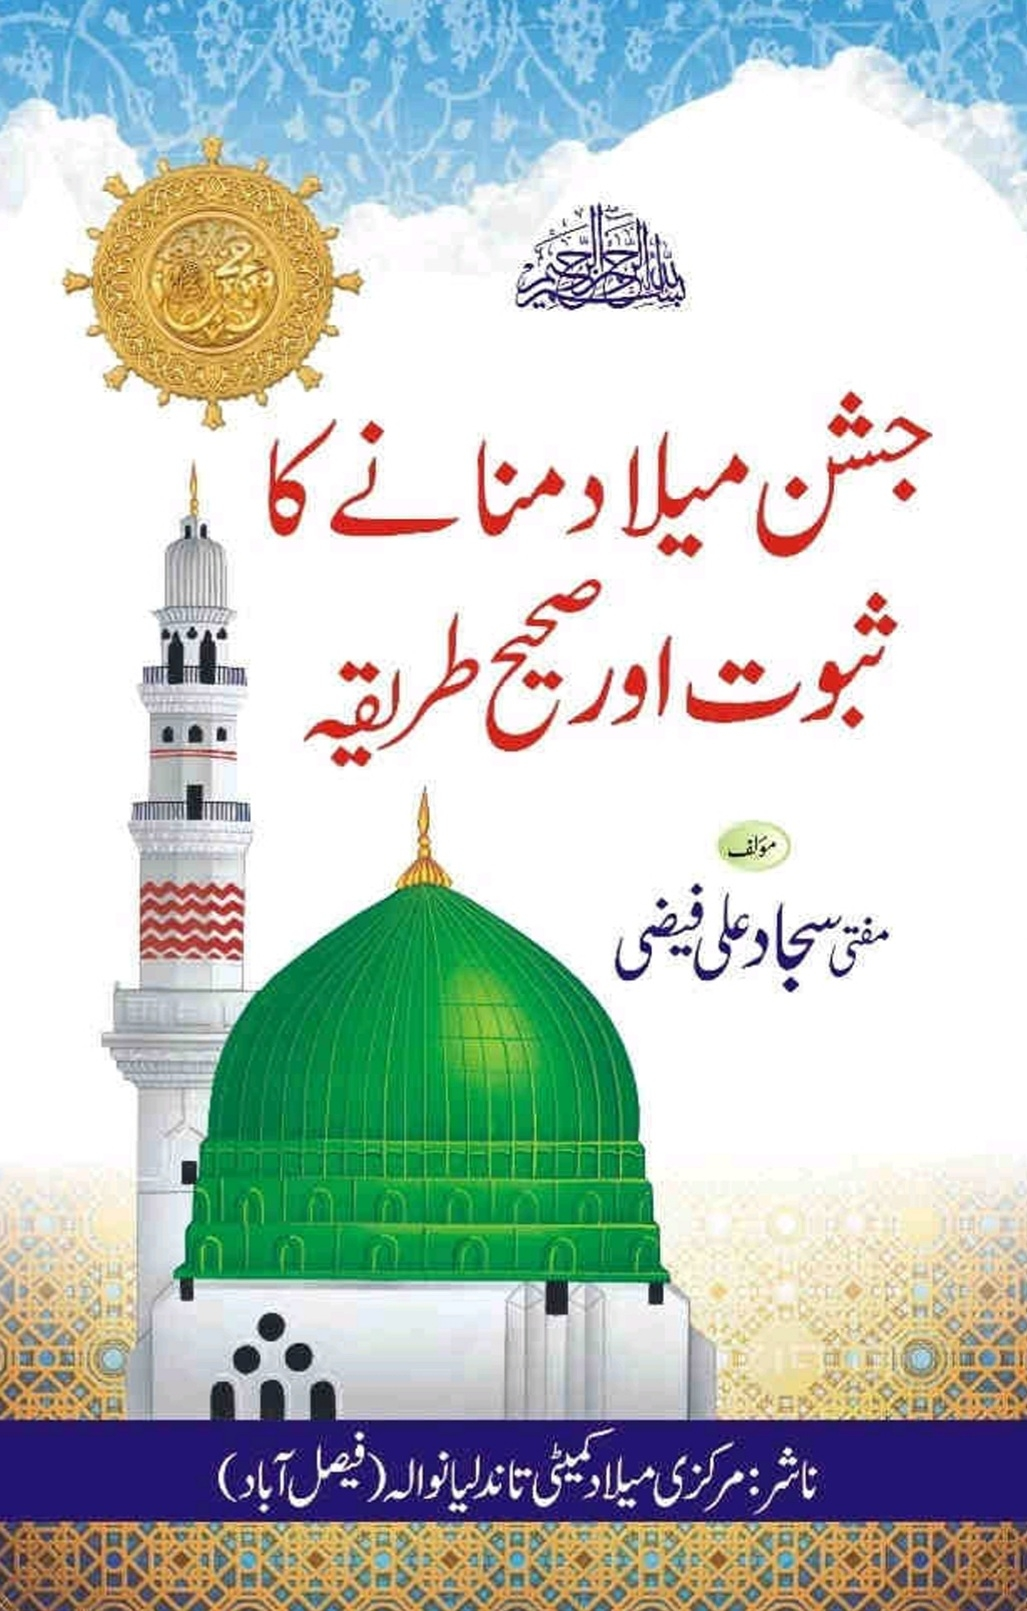 Jashan E Milaad Manane Ka Saboot Aur Sahi Tariqa / جشن میلاد منانے کا ثبوت اور صحیح طریقہby مفتی سجاد علی فیضی صاحب